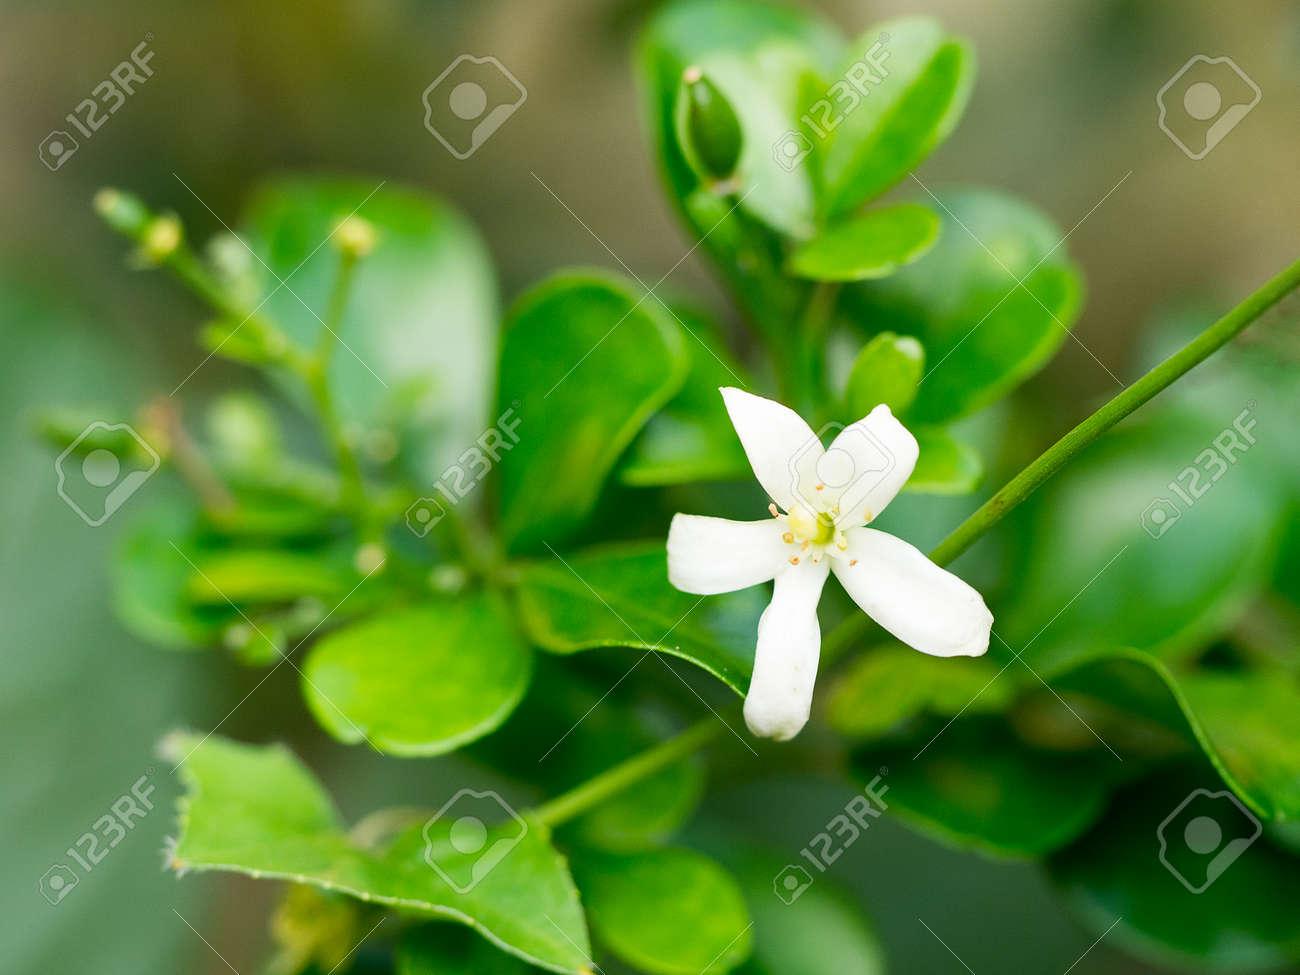 White flower orange jessamine flower sweet smell flower for stock photo white flower orange jessamine flower sweet smell flower for make perfume mightylinksfo